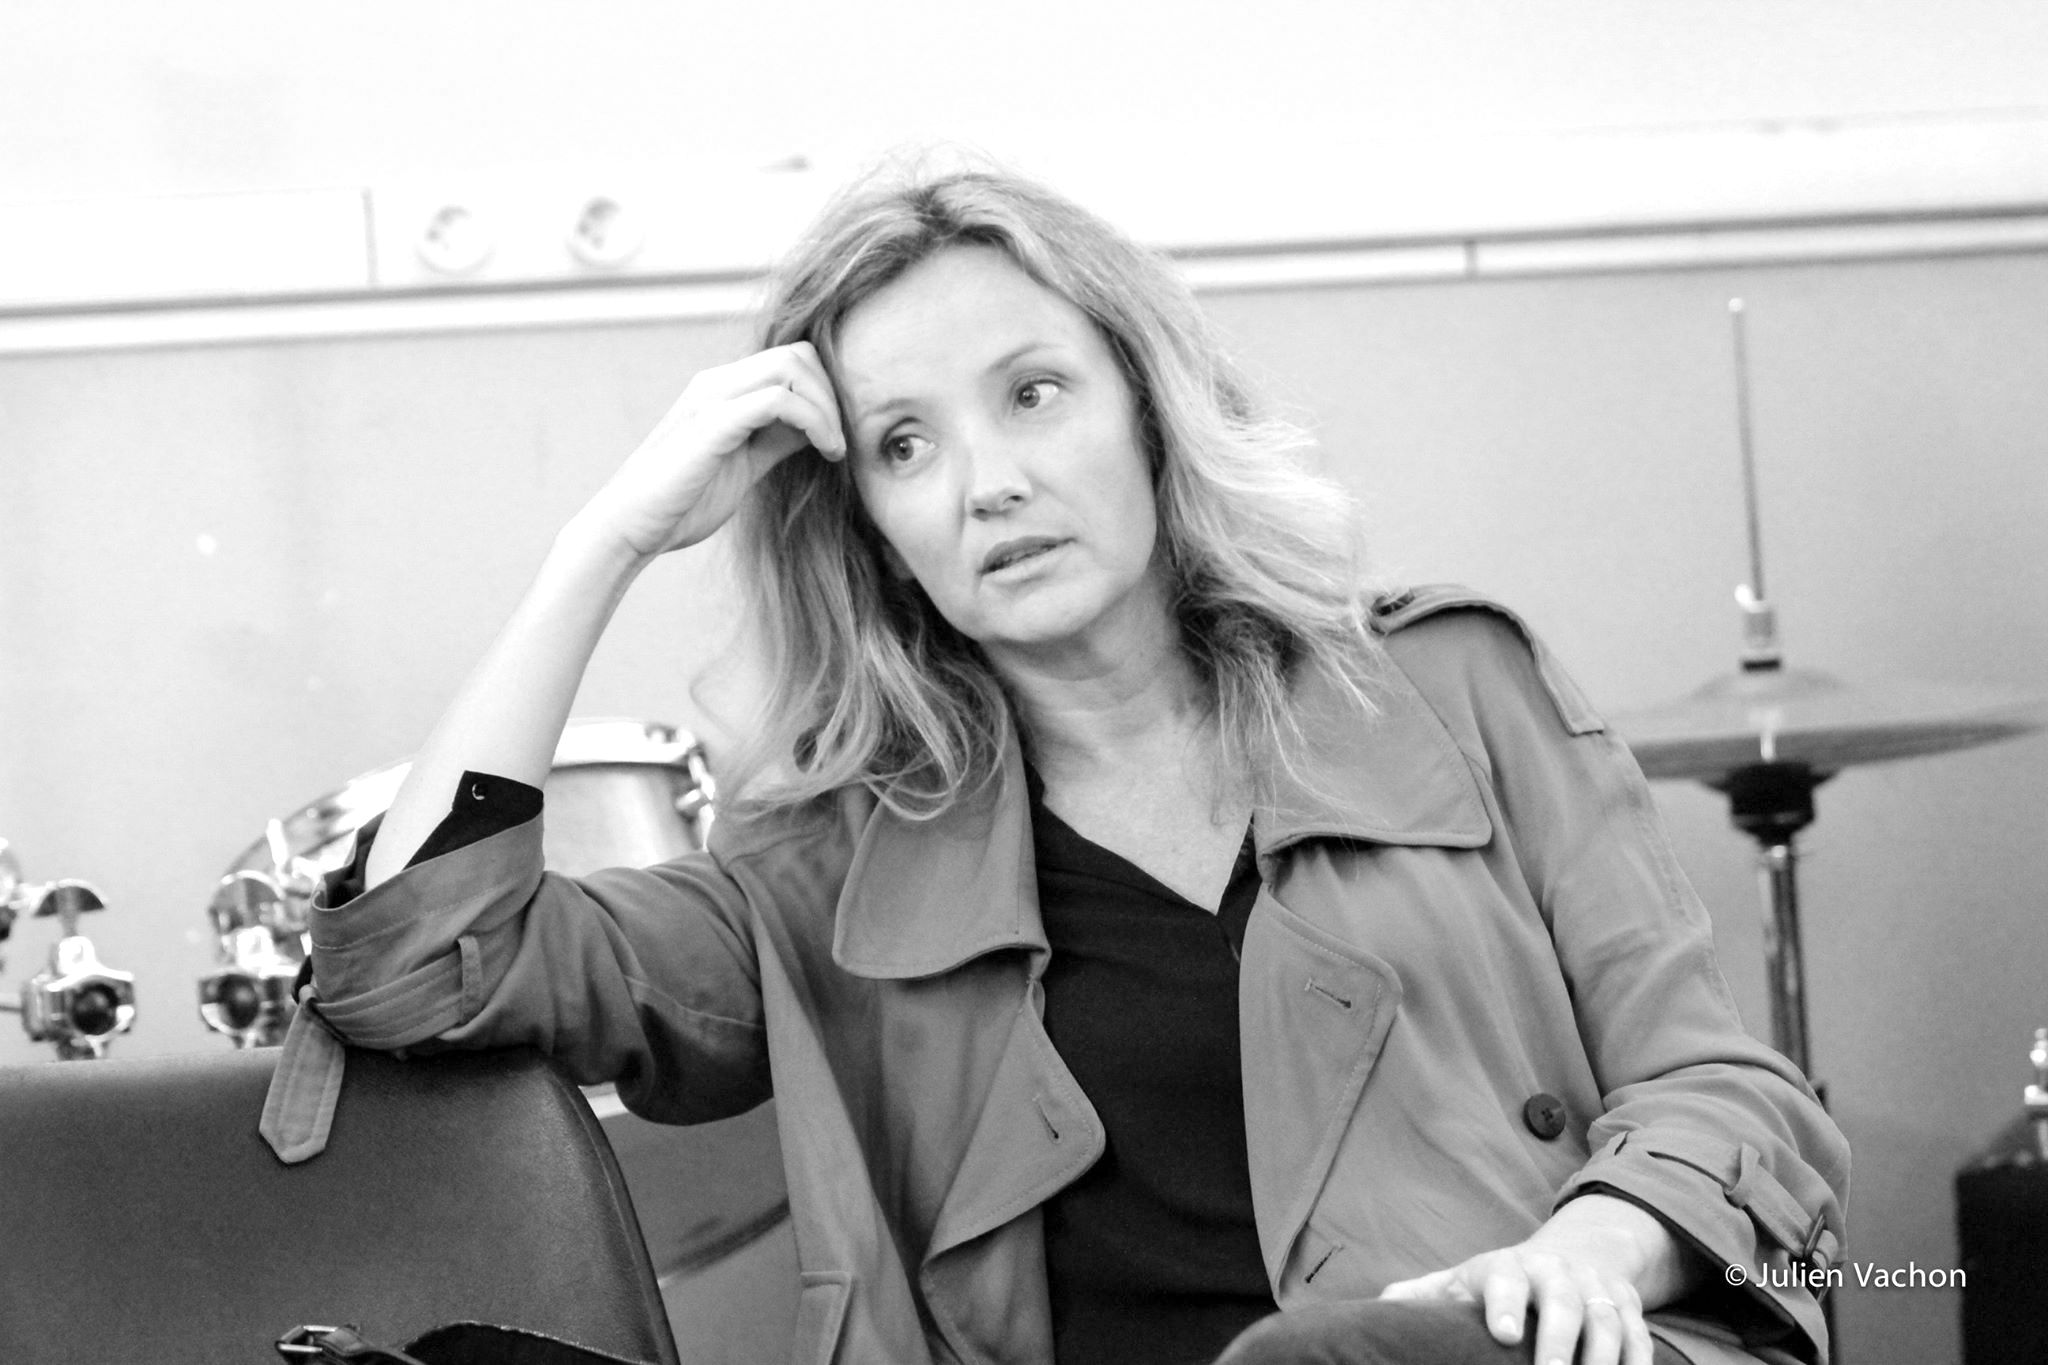 Eléonore de Galard - Avocate et productrice